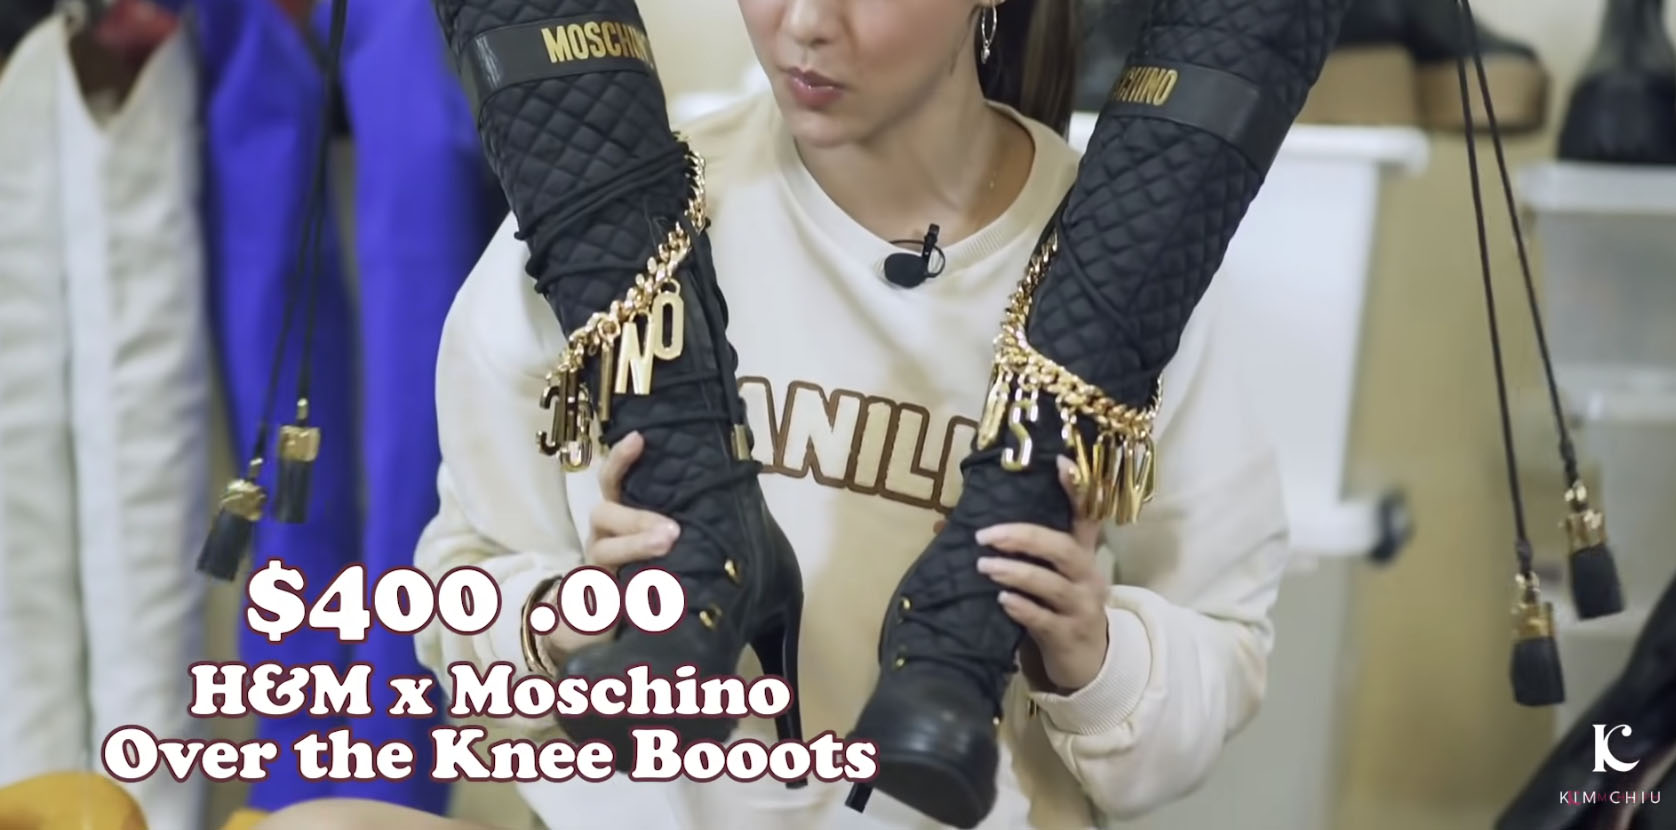 Youtube Vlog Screengrab: Kim Chiu H&M x Moschino's collection